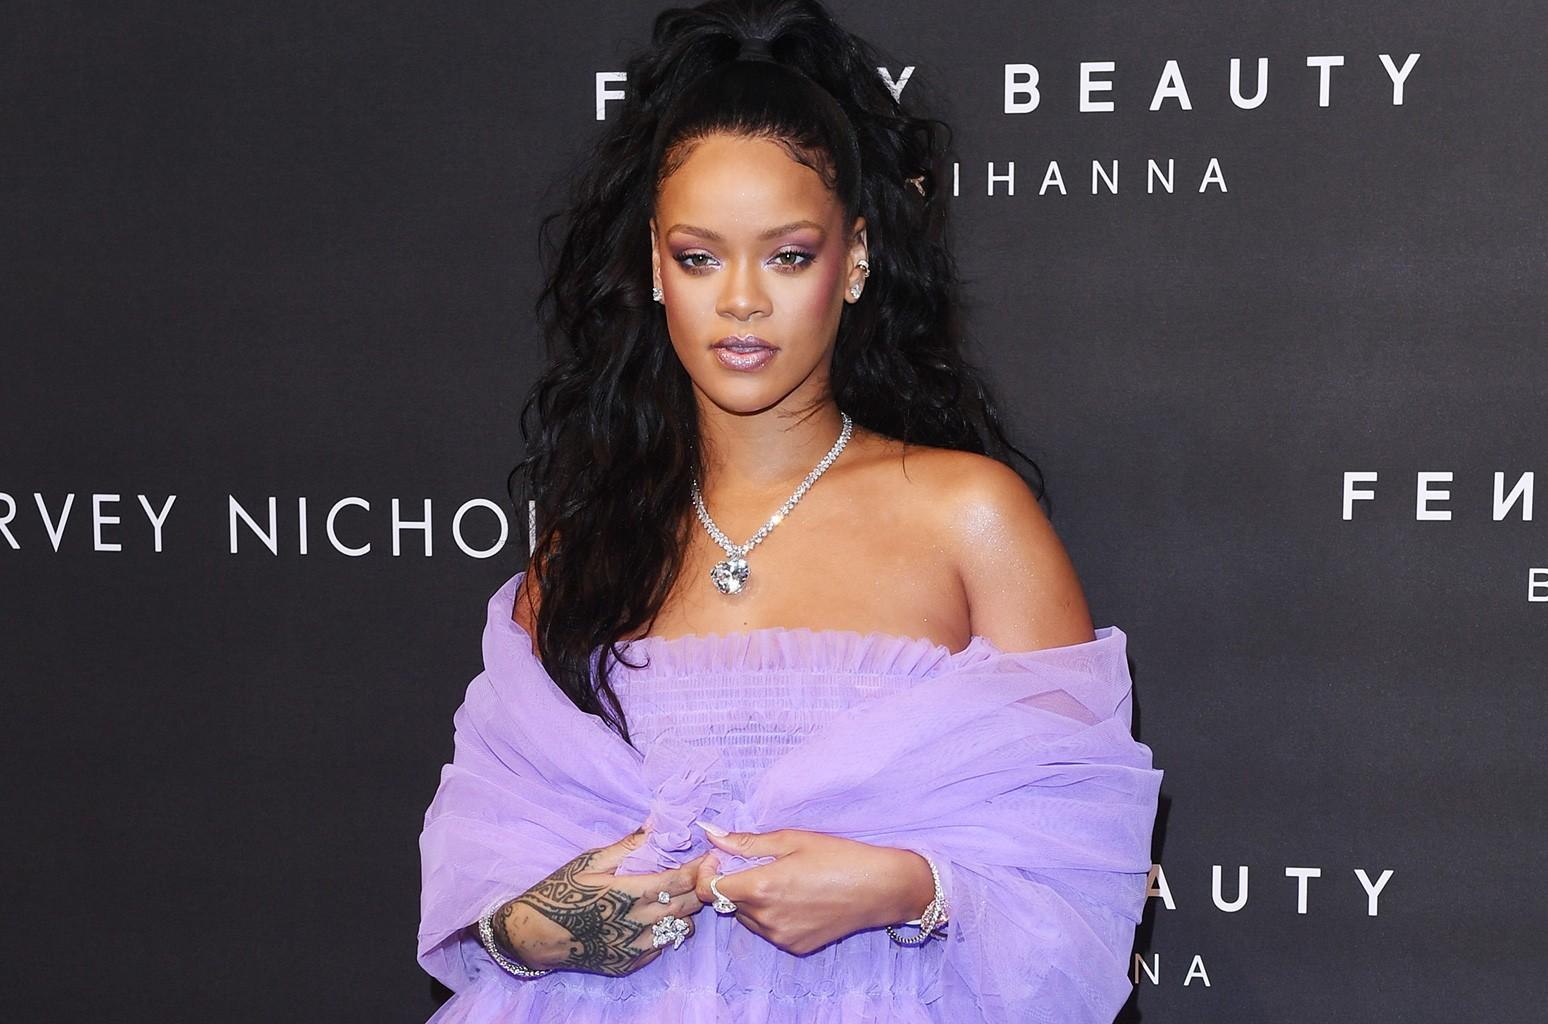 Rihanna attends the 'FENTY Beauty' by Rihanna launch at Harvey Nichols Knightsbridge on Sept. 19, 2017 in London.